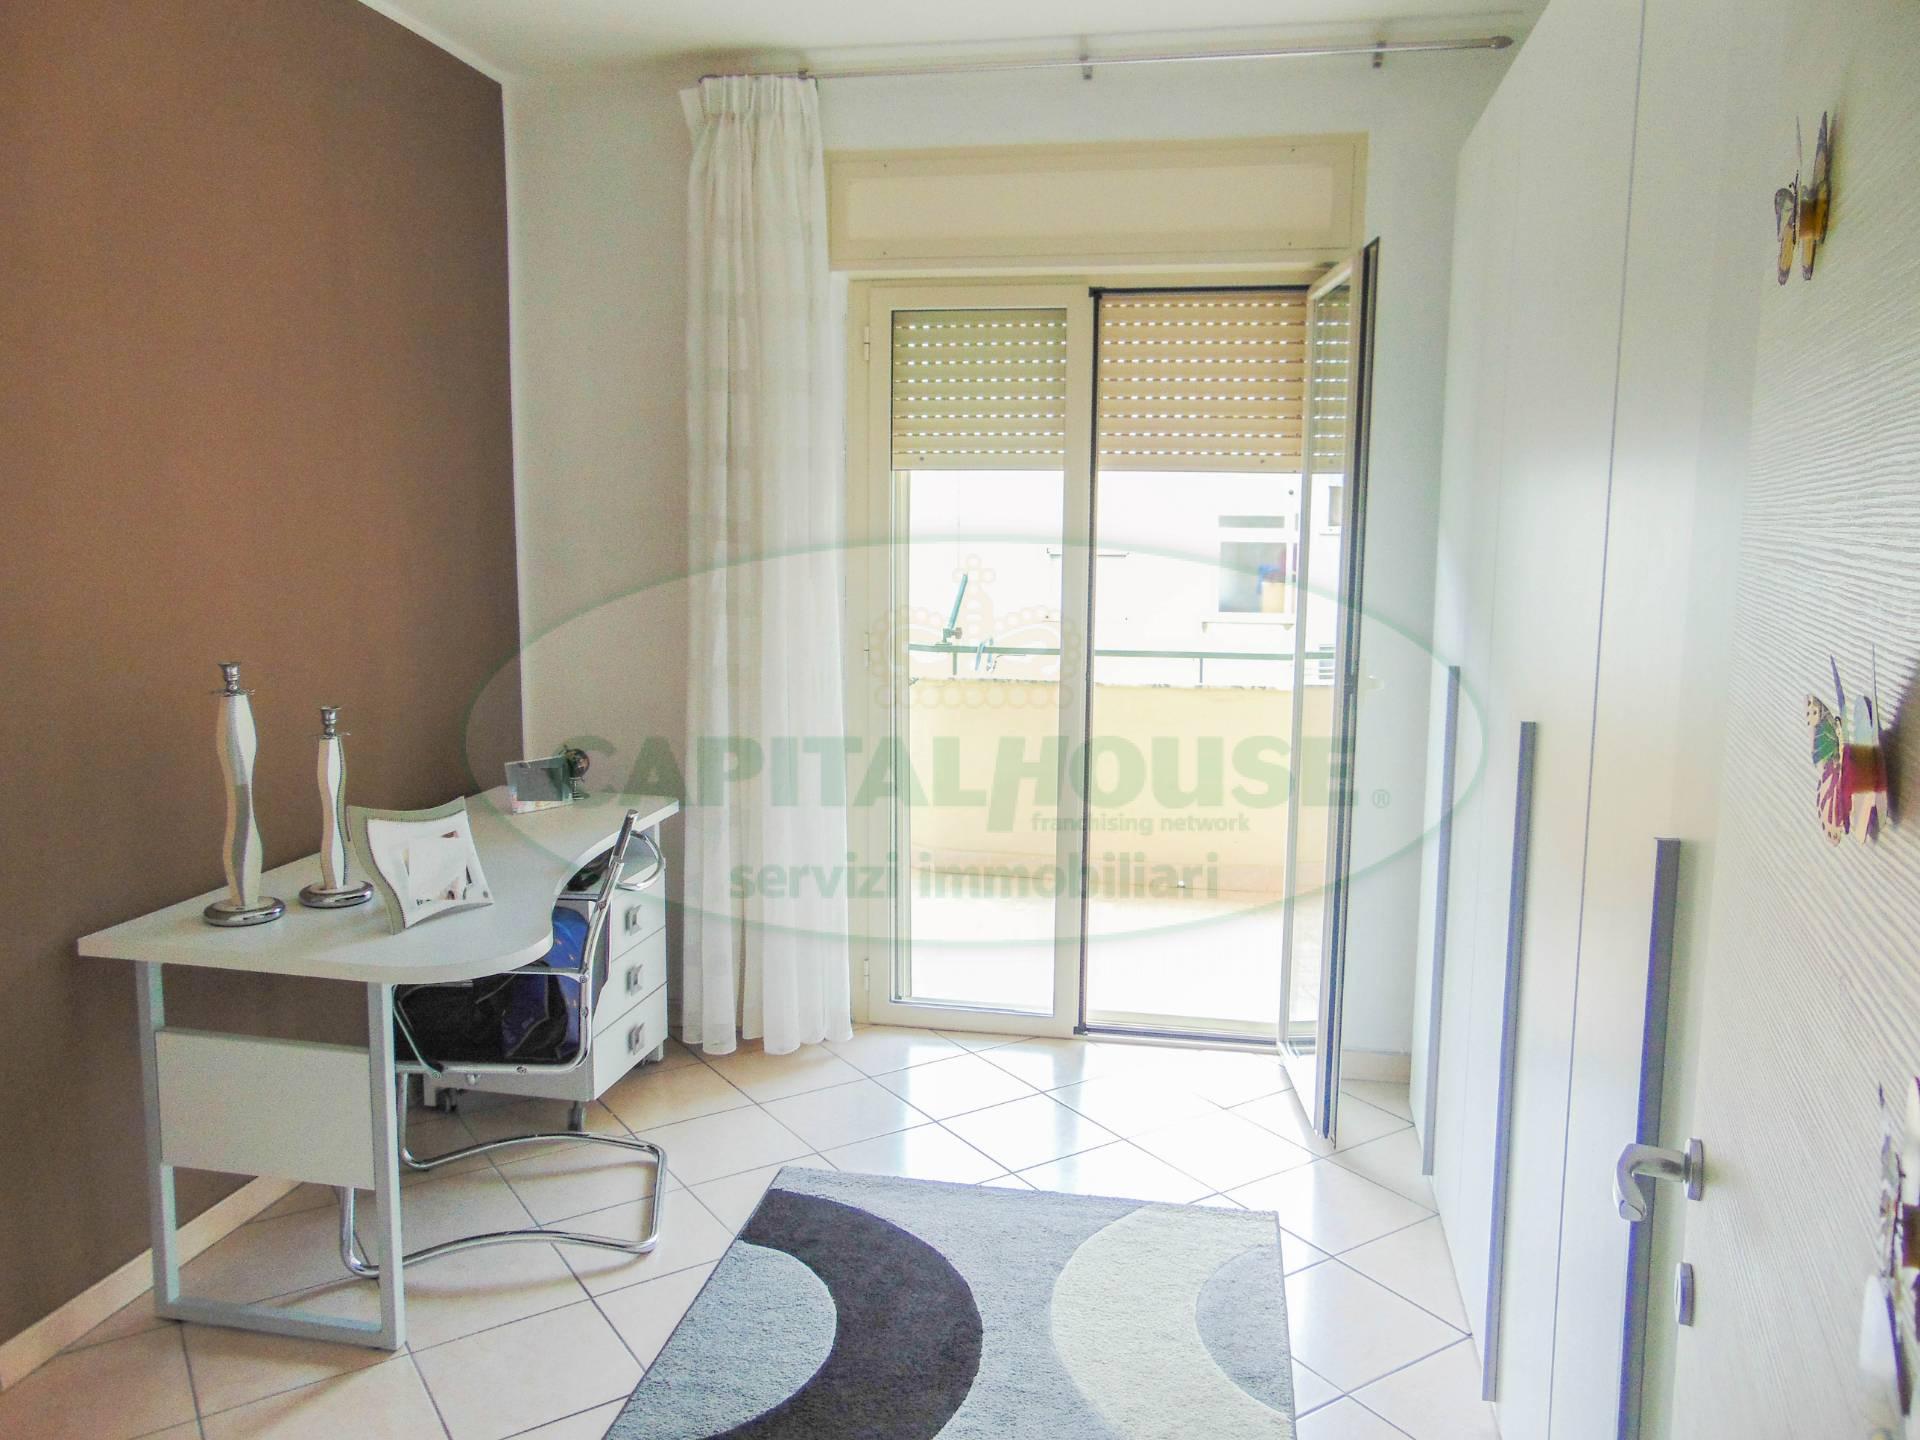 155SANPRISCO  Appartamento in Vendita a San Prisco  Zona Piscina